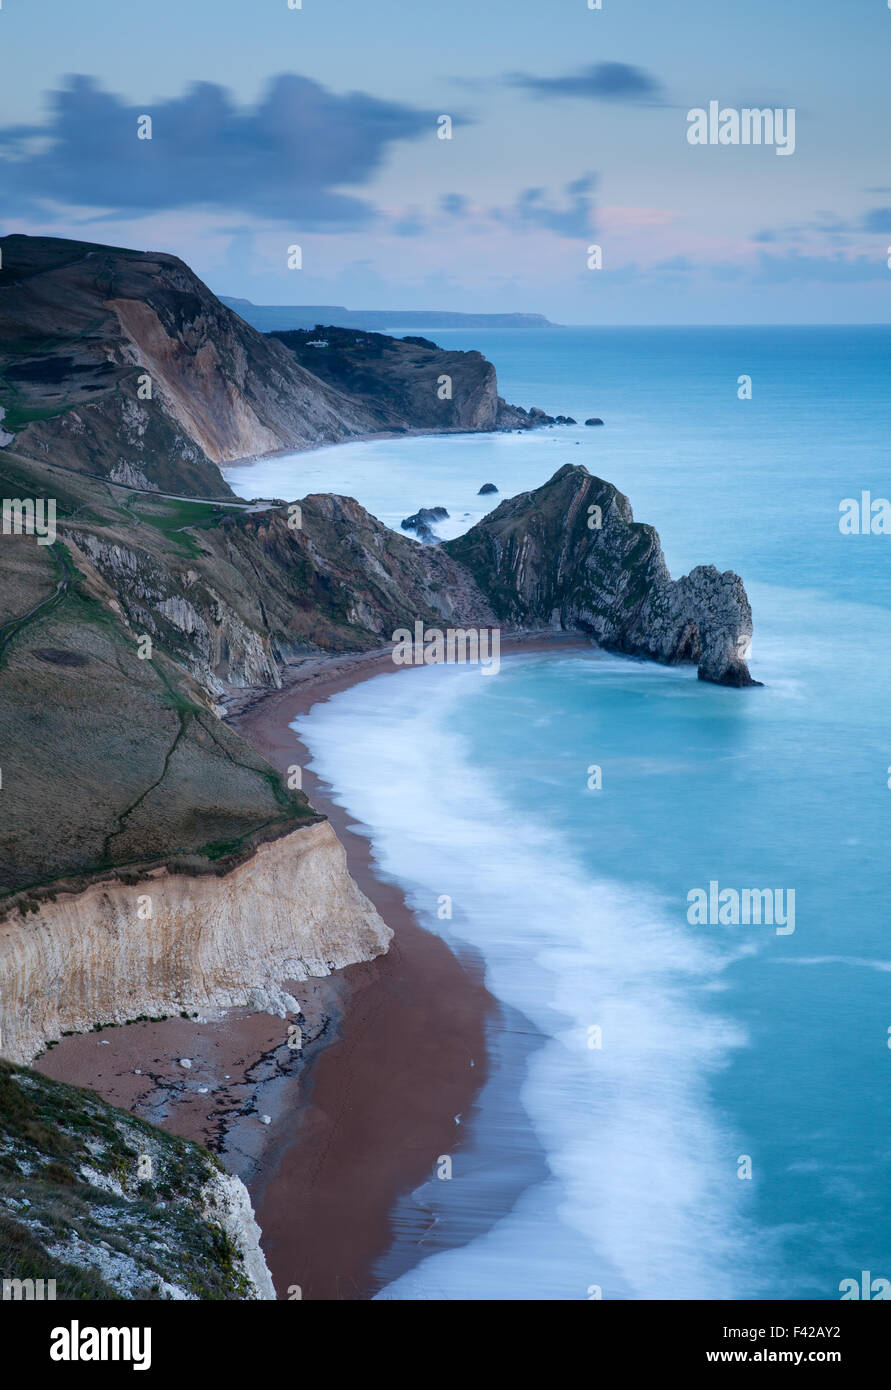 Durdle Door and the Jurassic Coast from Bat's Head, Dorset, England, UK - Stock Image